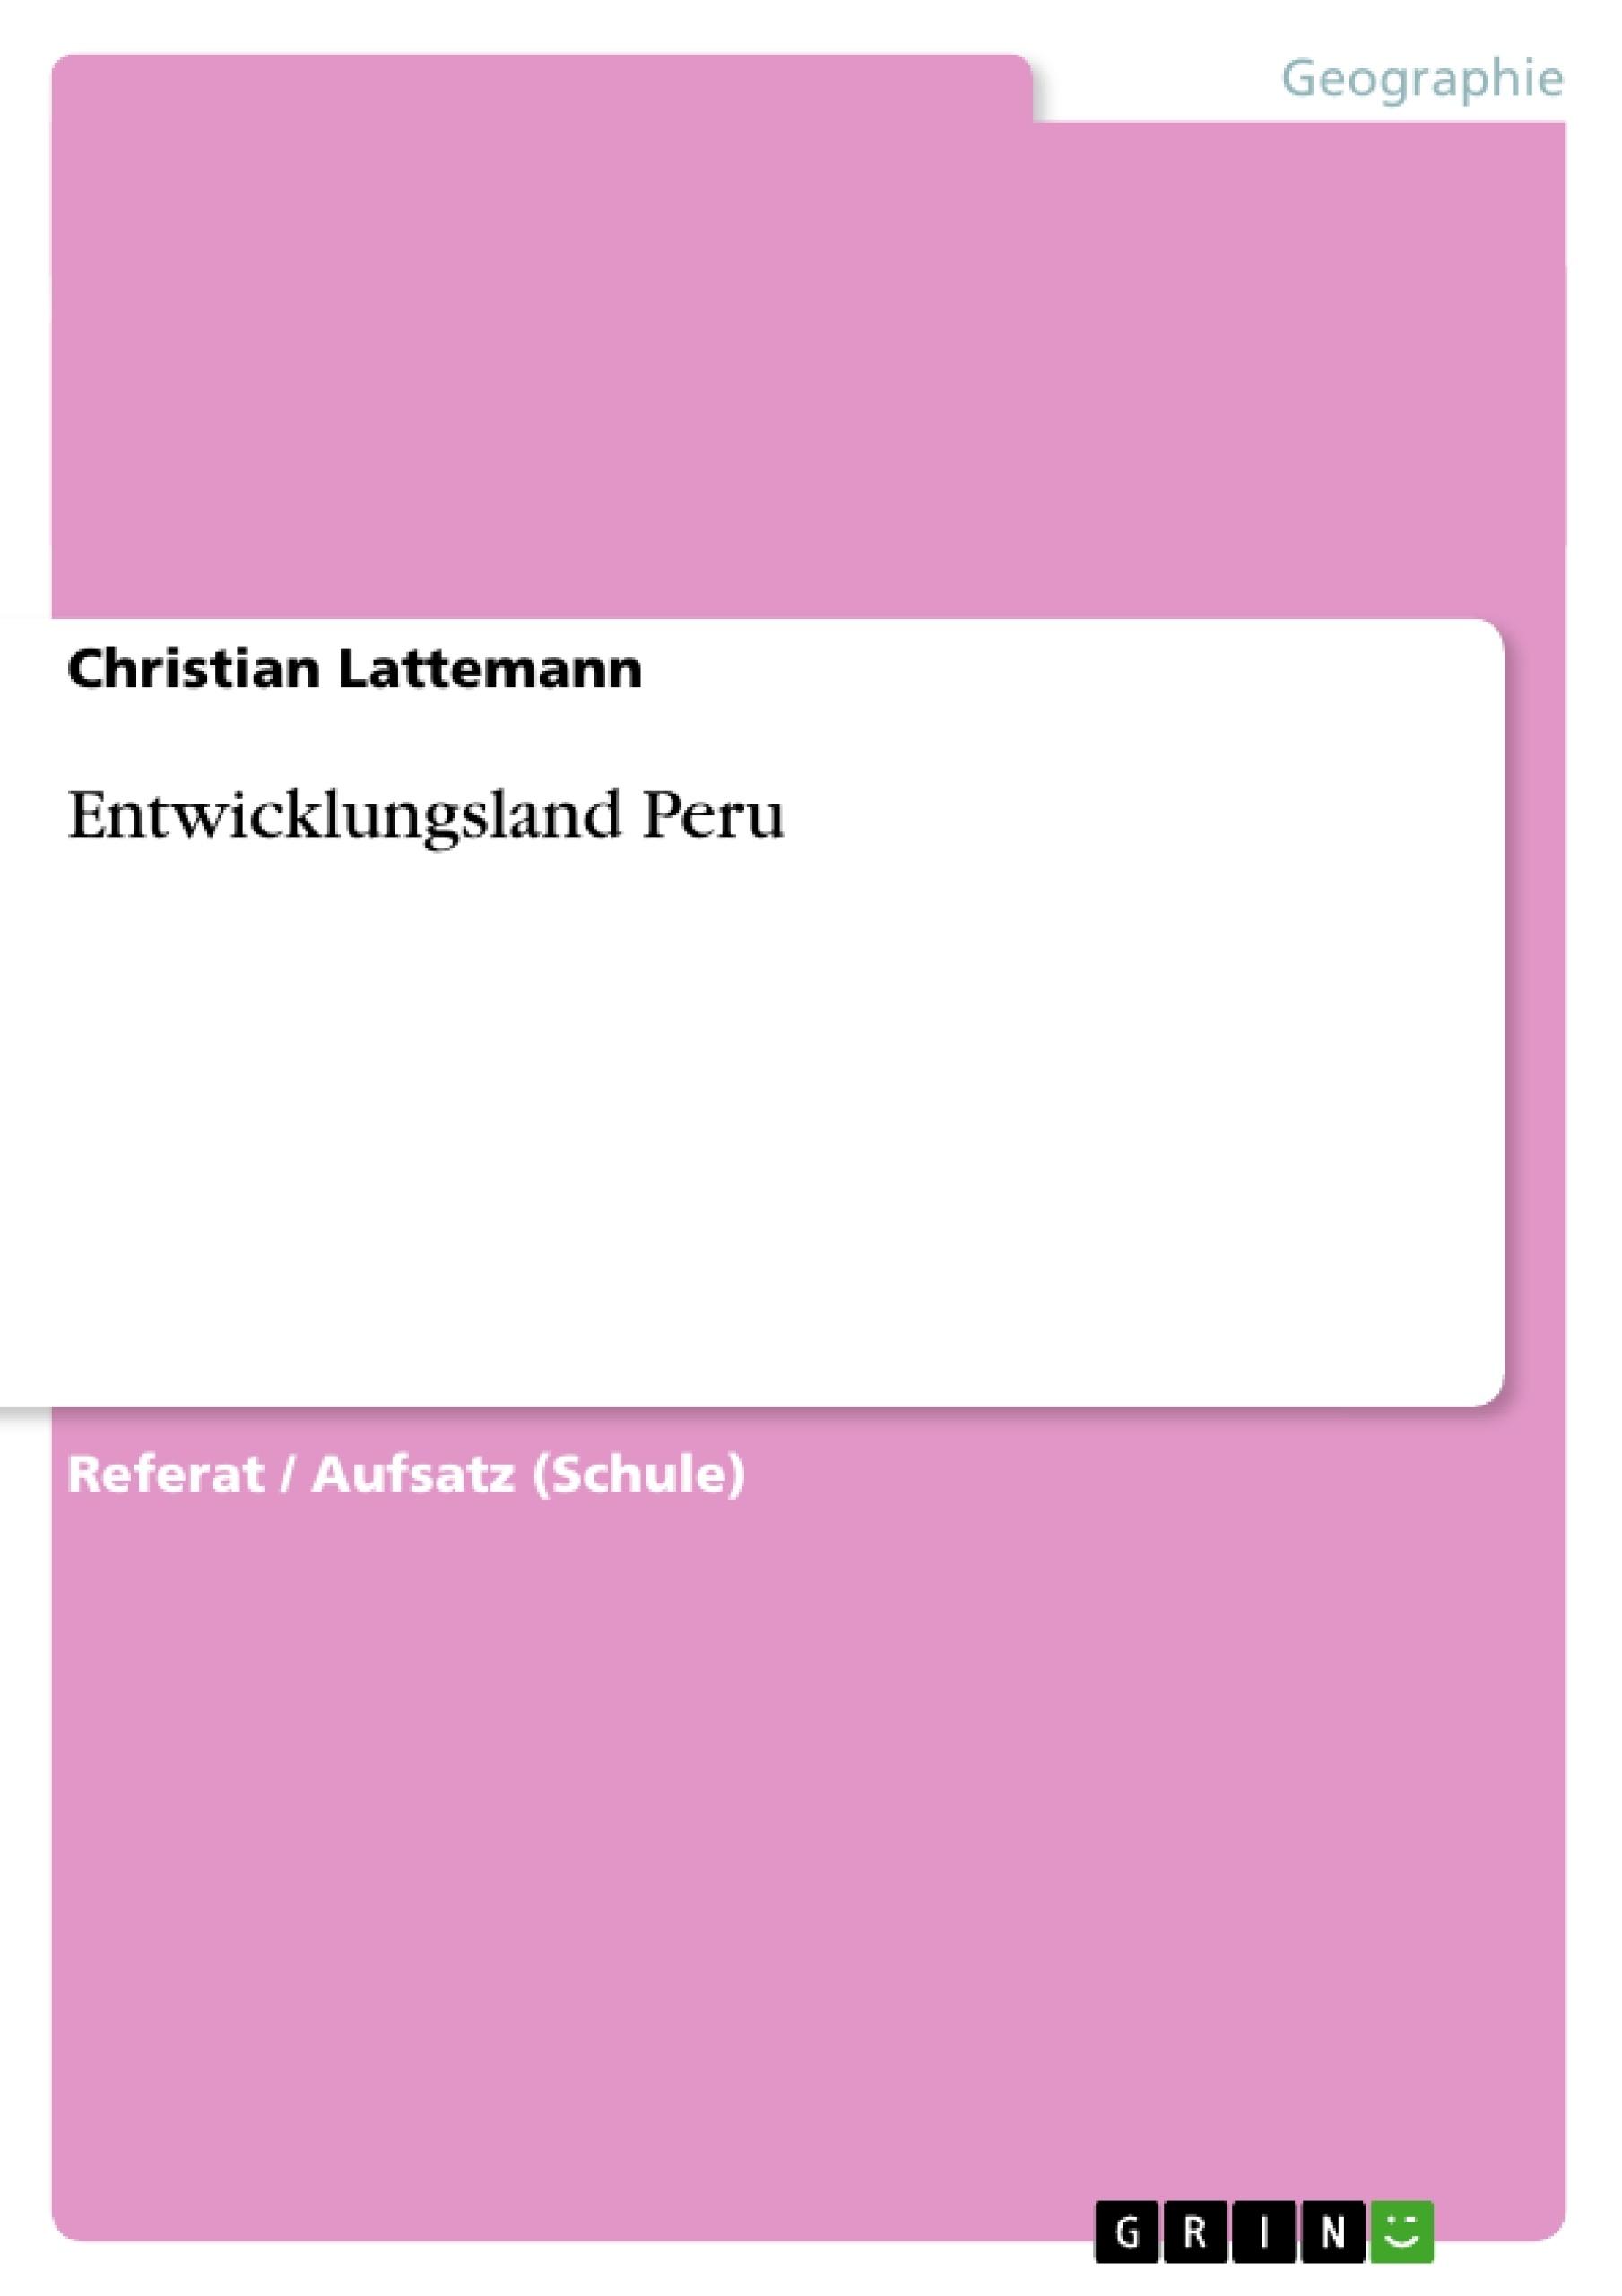 Titel: Entwicklungsland Peru